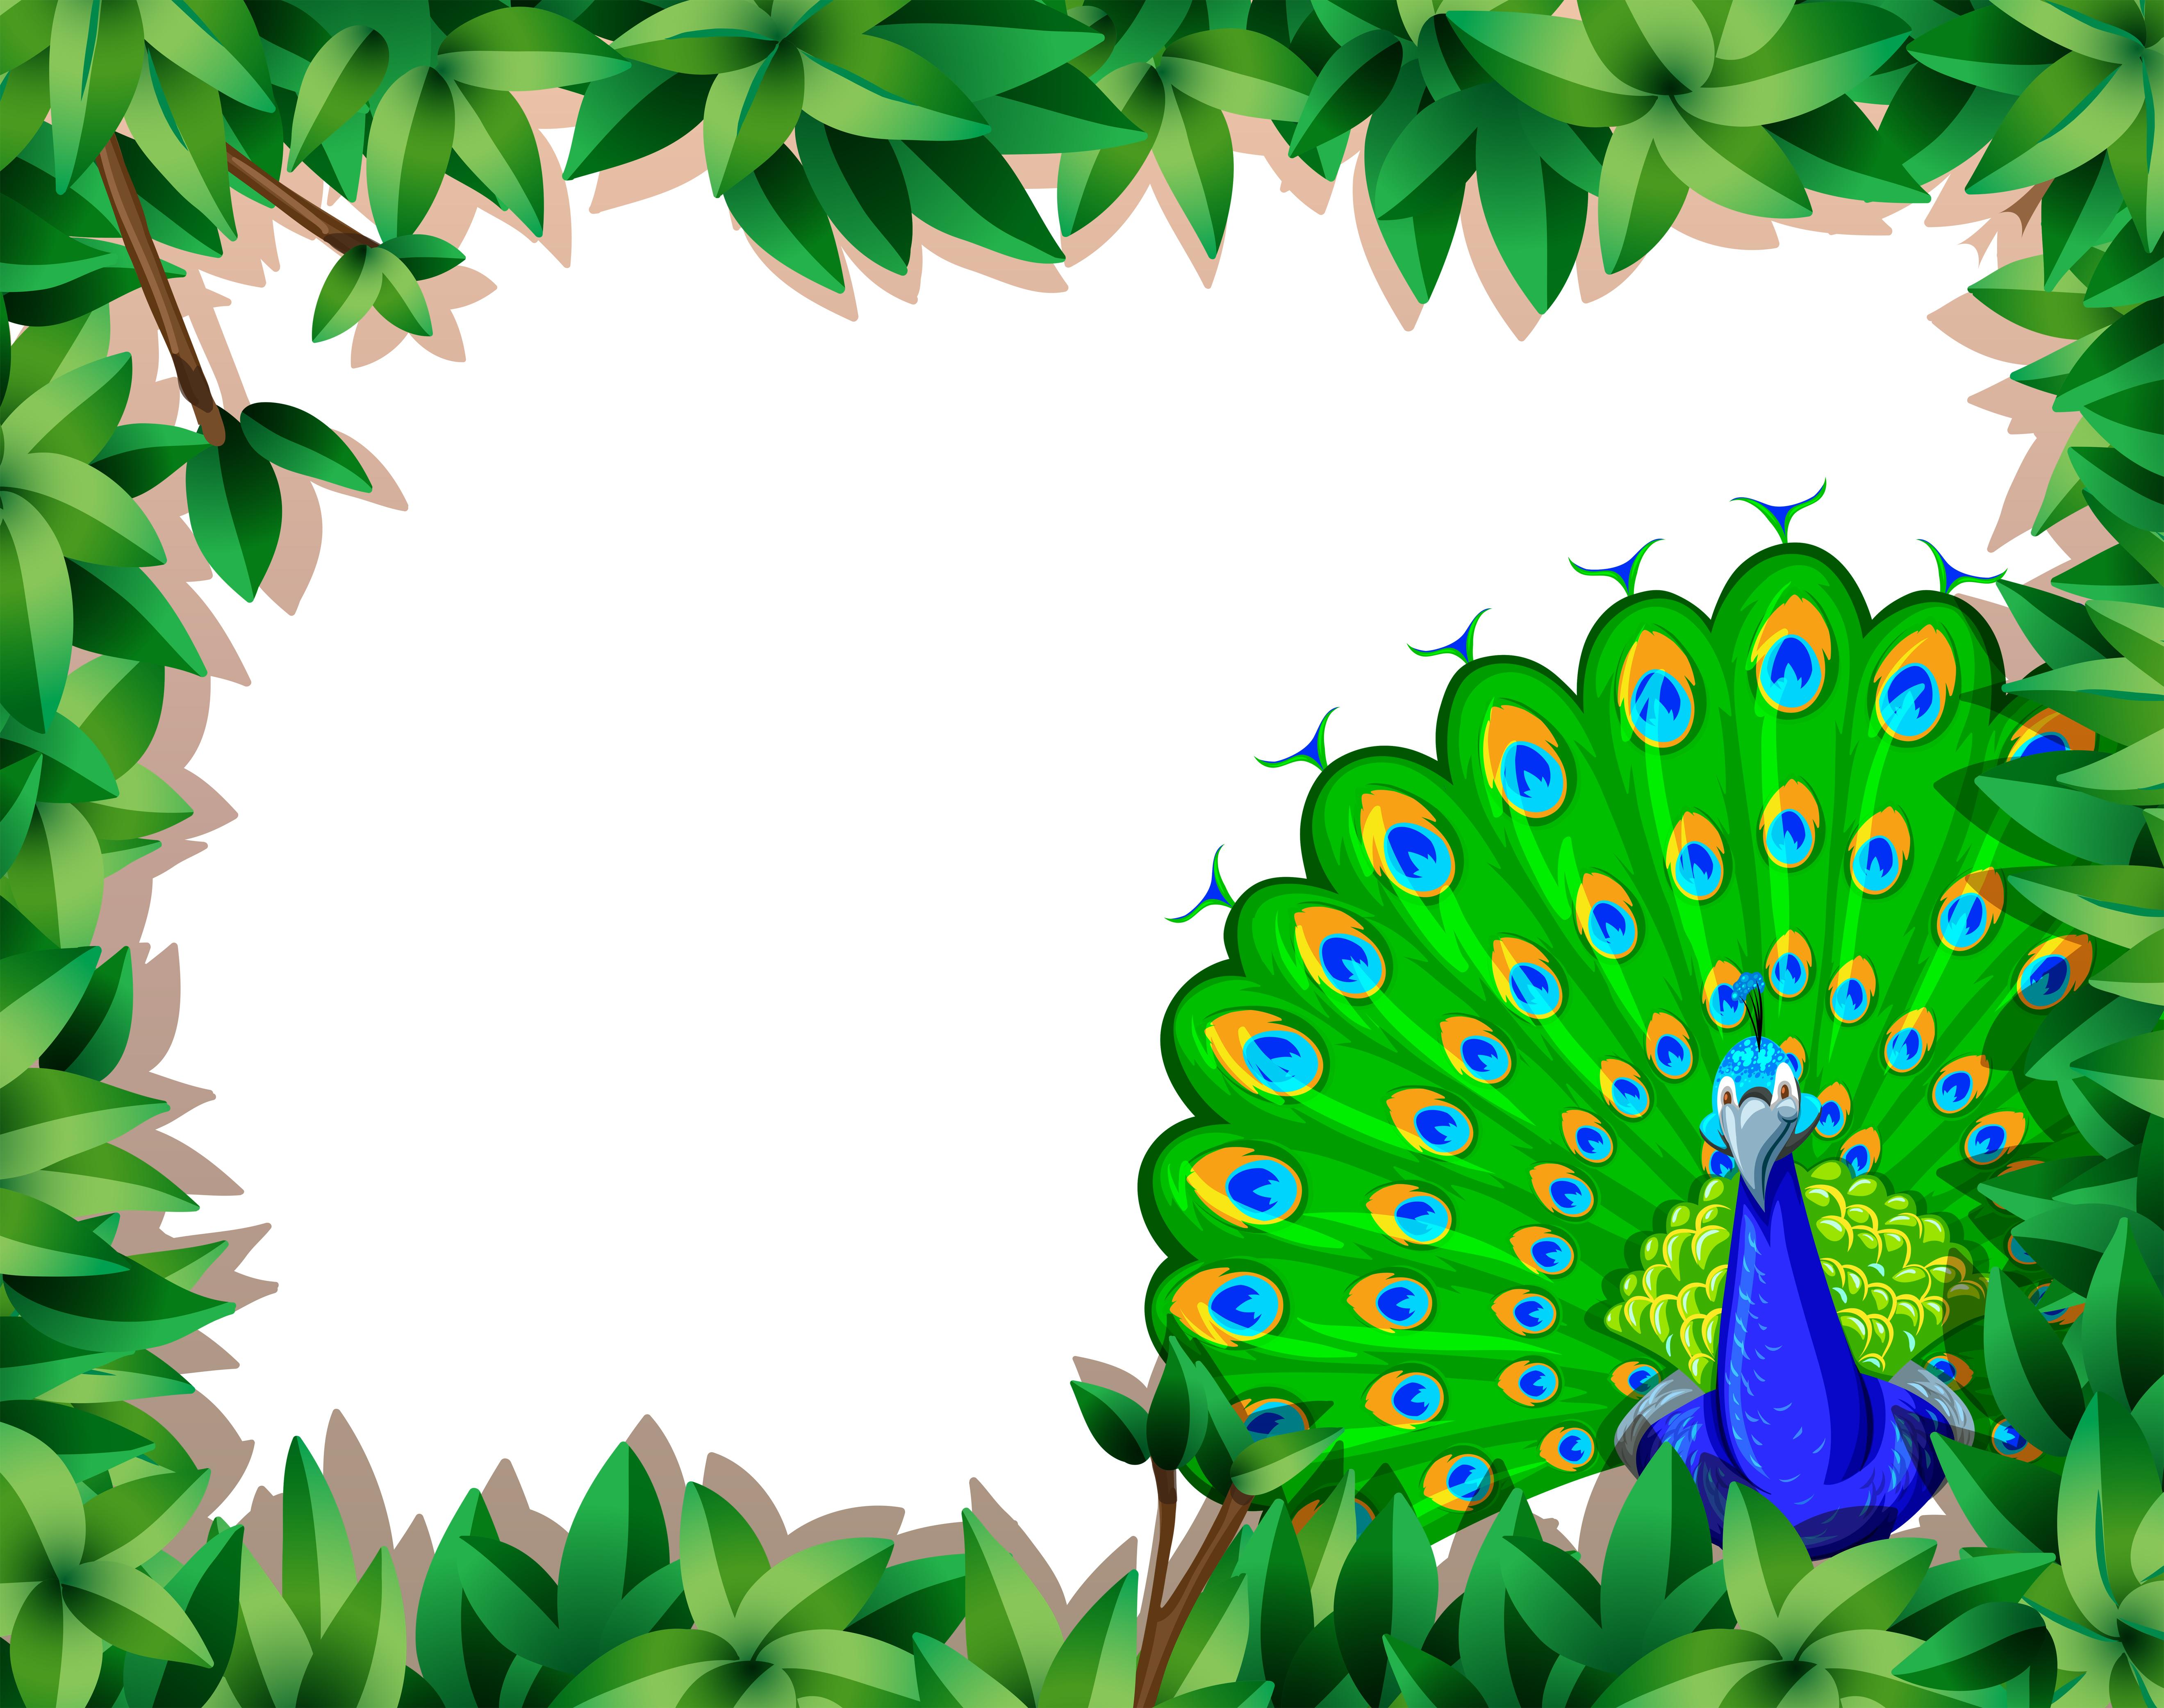 peacock borders free vector art